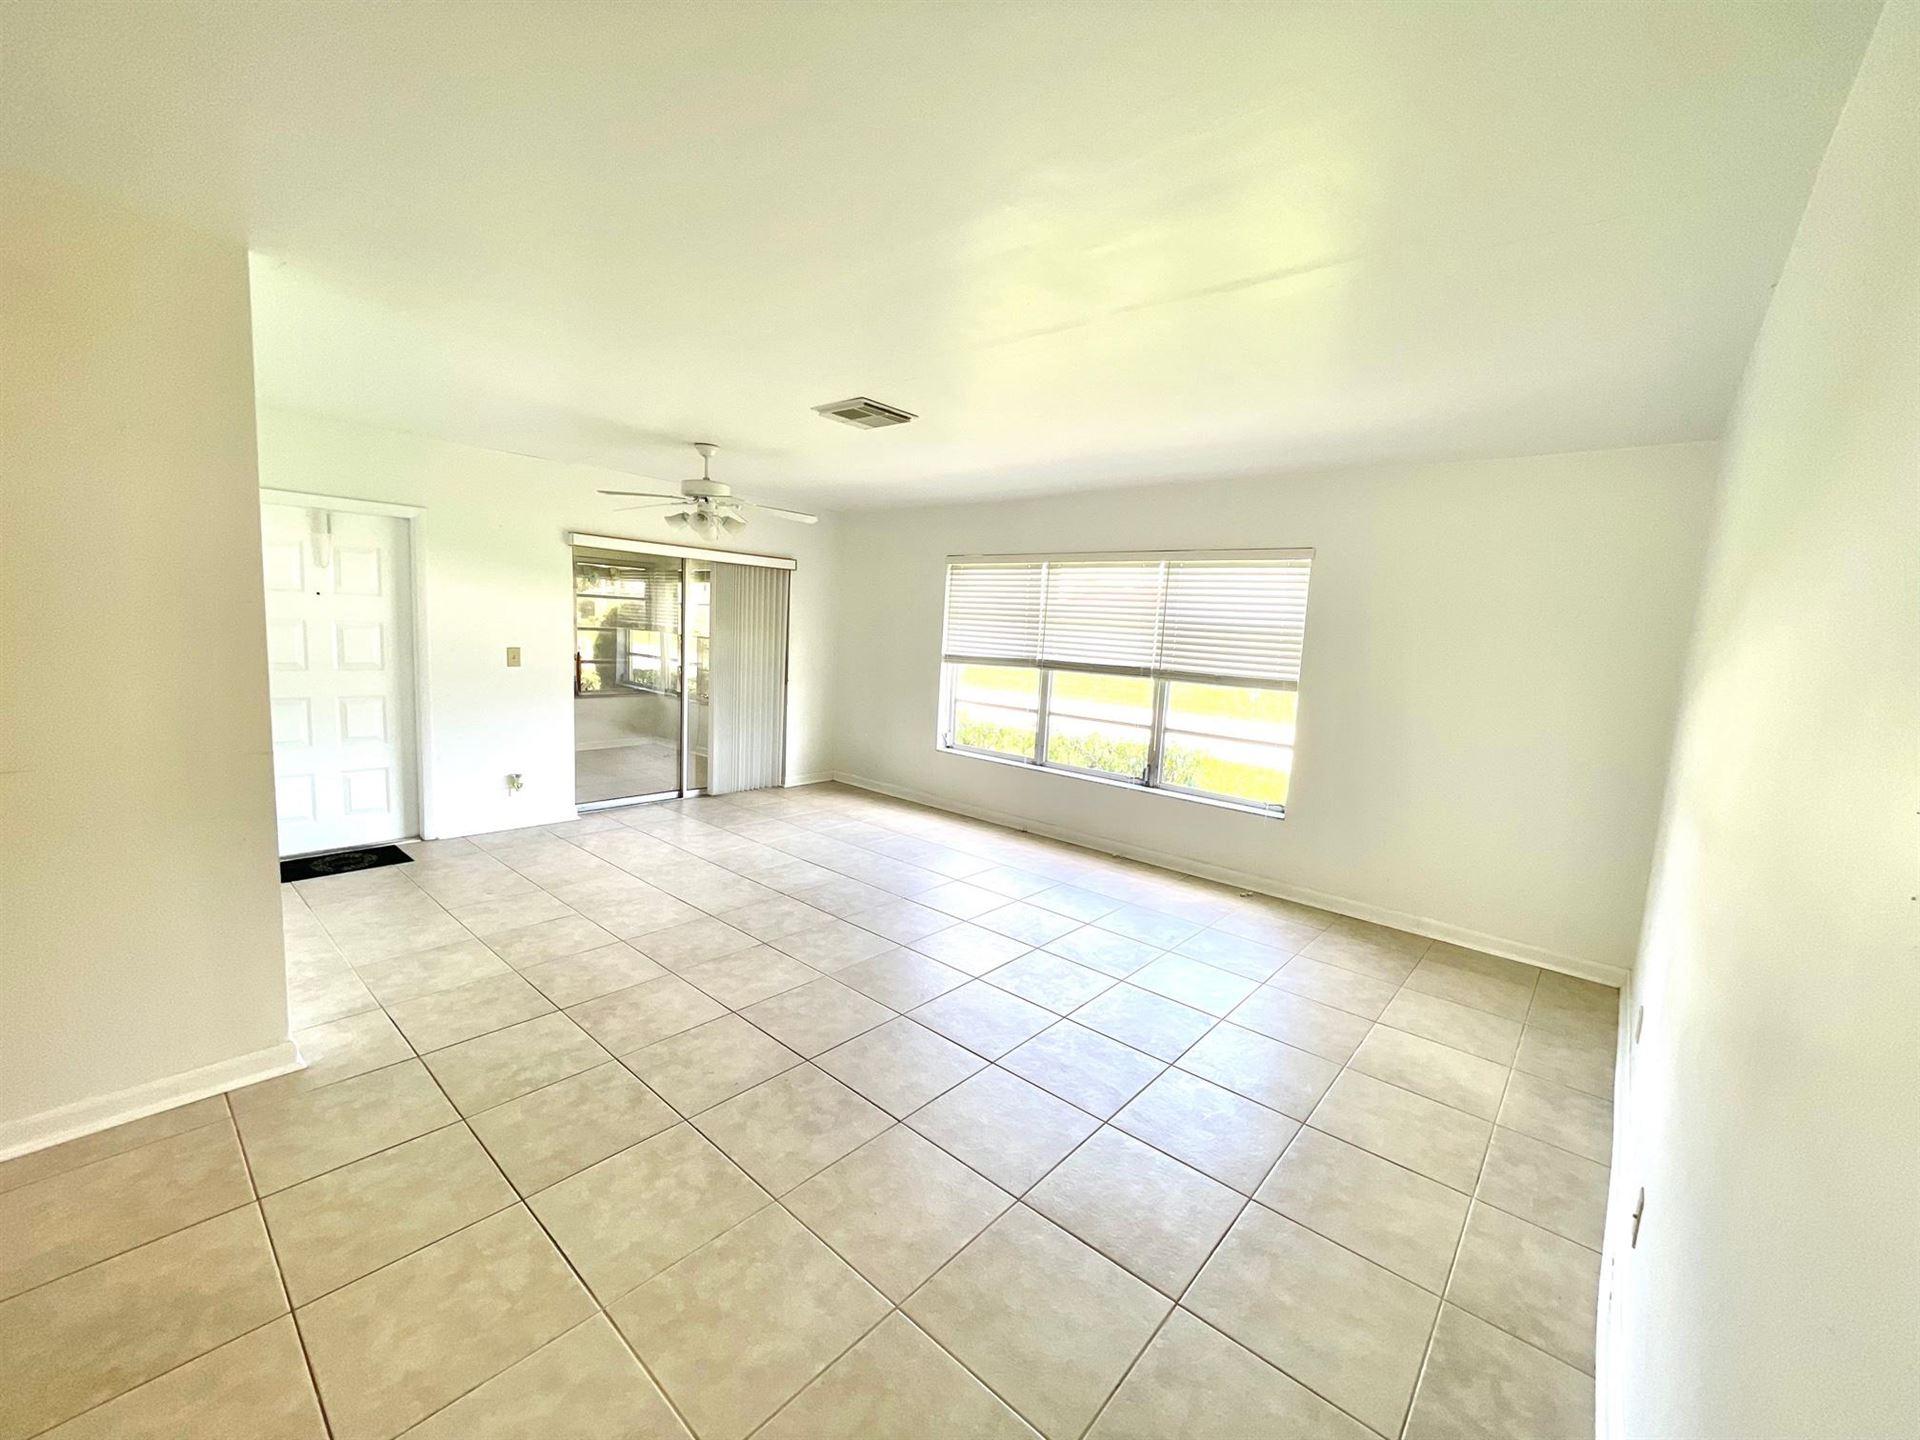 1700 W Royal Tern Lane #Apt. A, Fort Pierce, FL 34982 - MLS#: RX-10729068